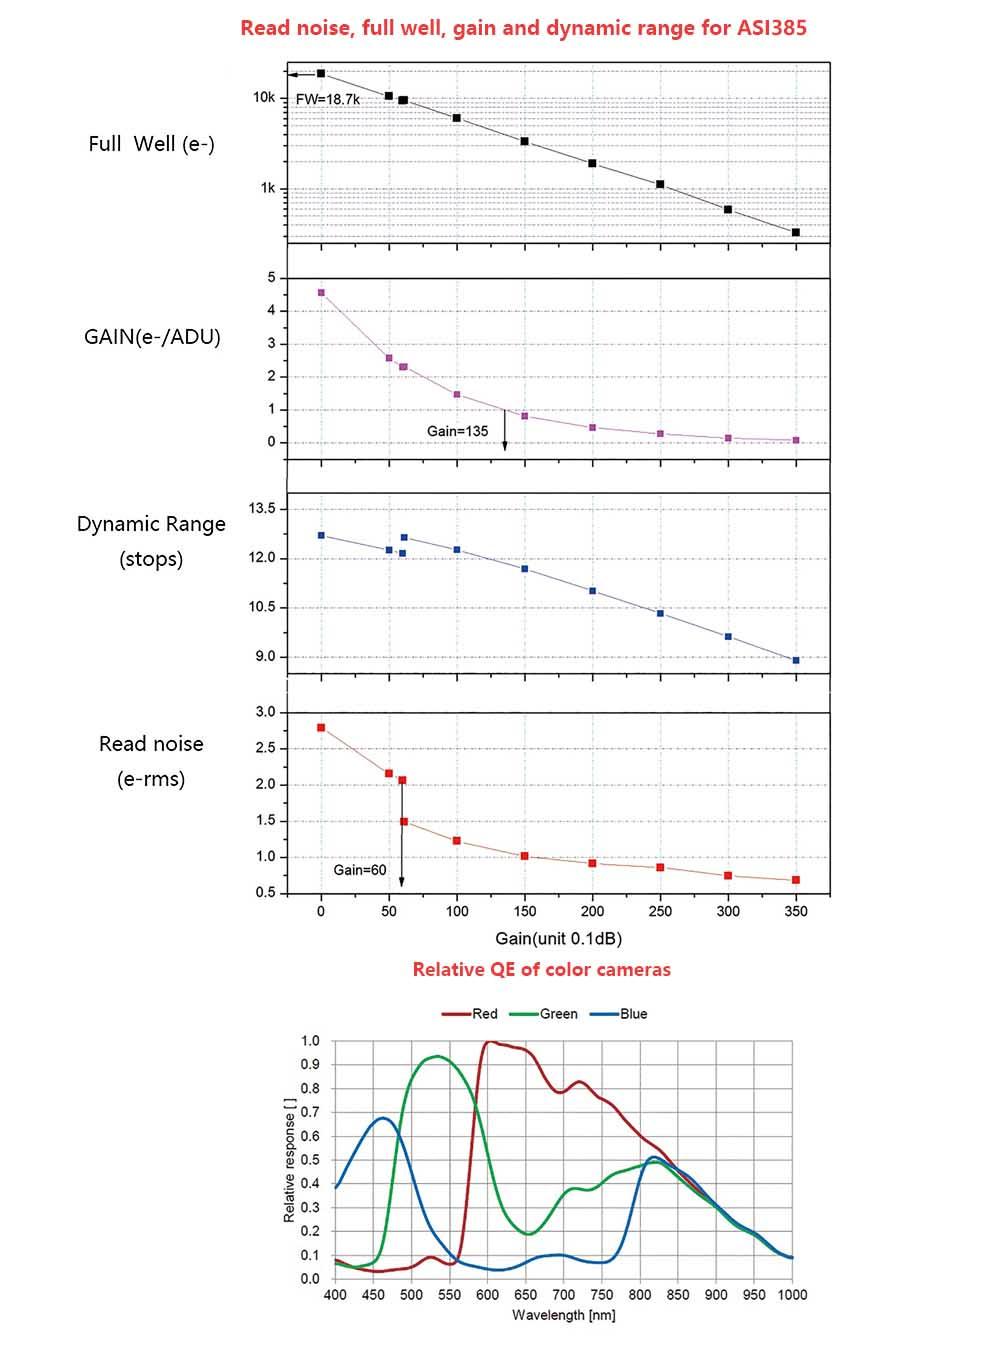 ASI385-readnoise-fullwell-gain-dynamic-rang-QE1.jpg